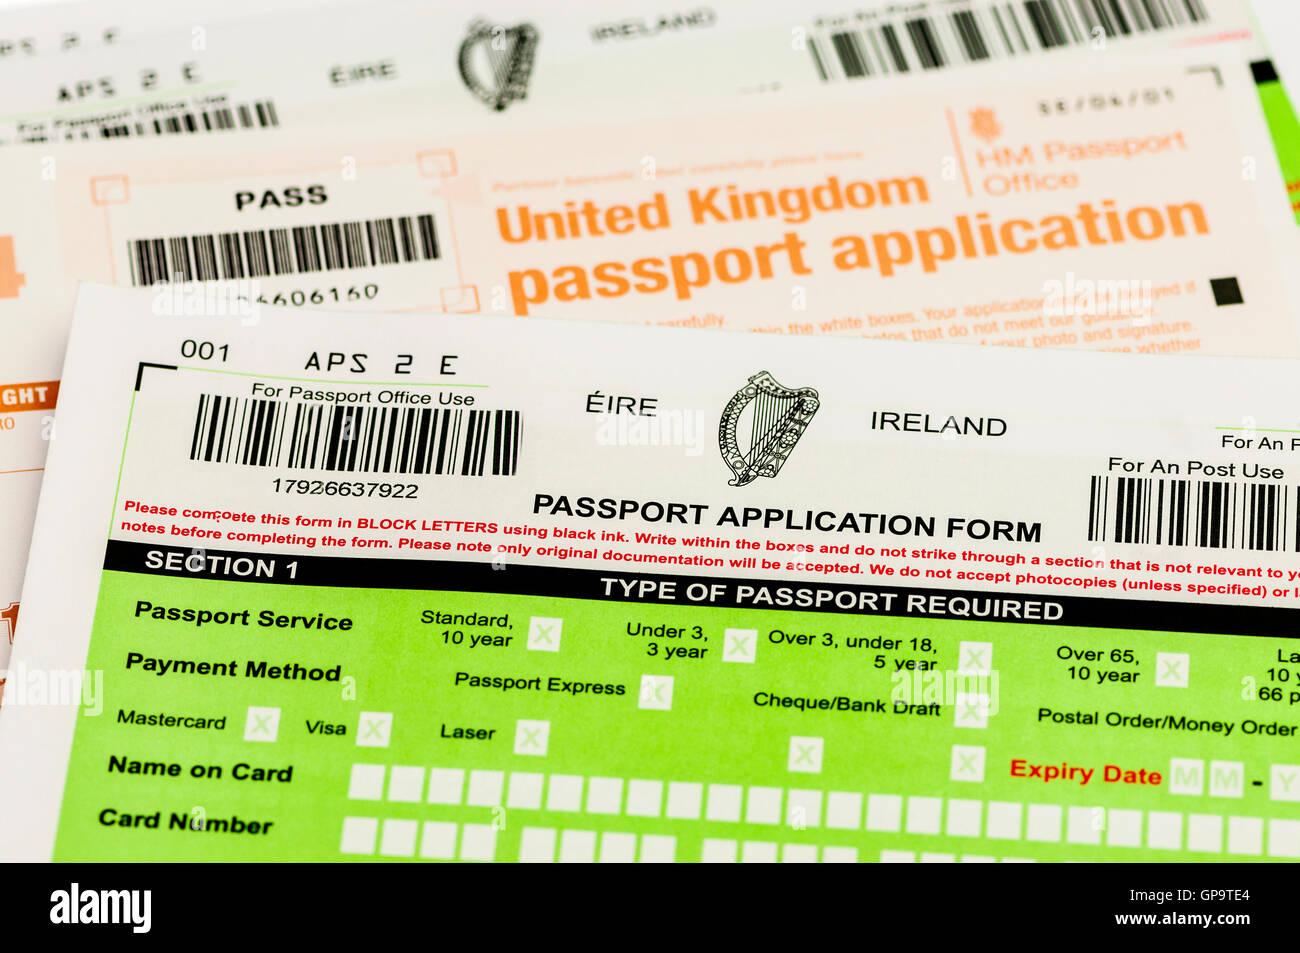 Passport application forms for both republic of ireland eire and passport application forms for both republic of ireland eire and united kingdom uk falaconquin